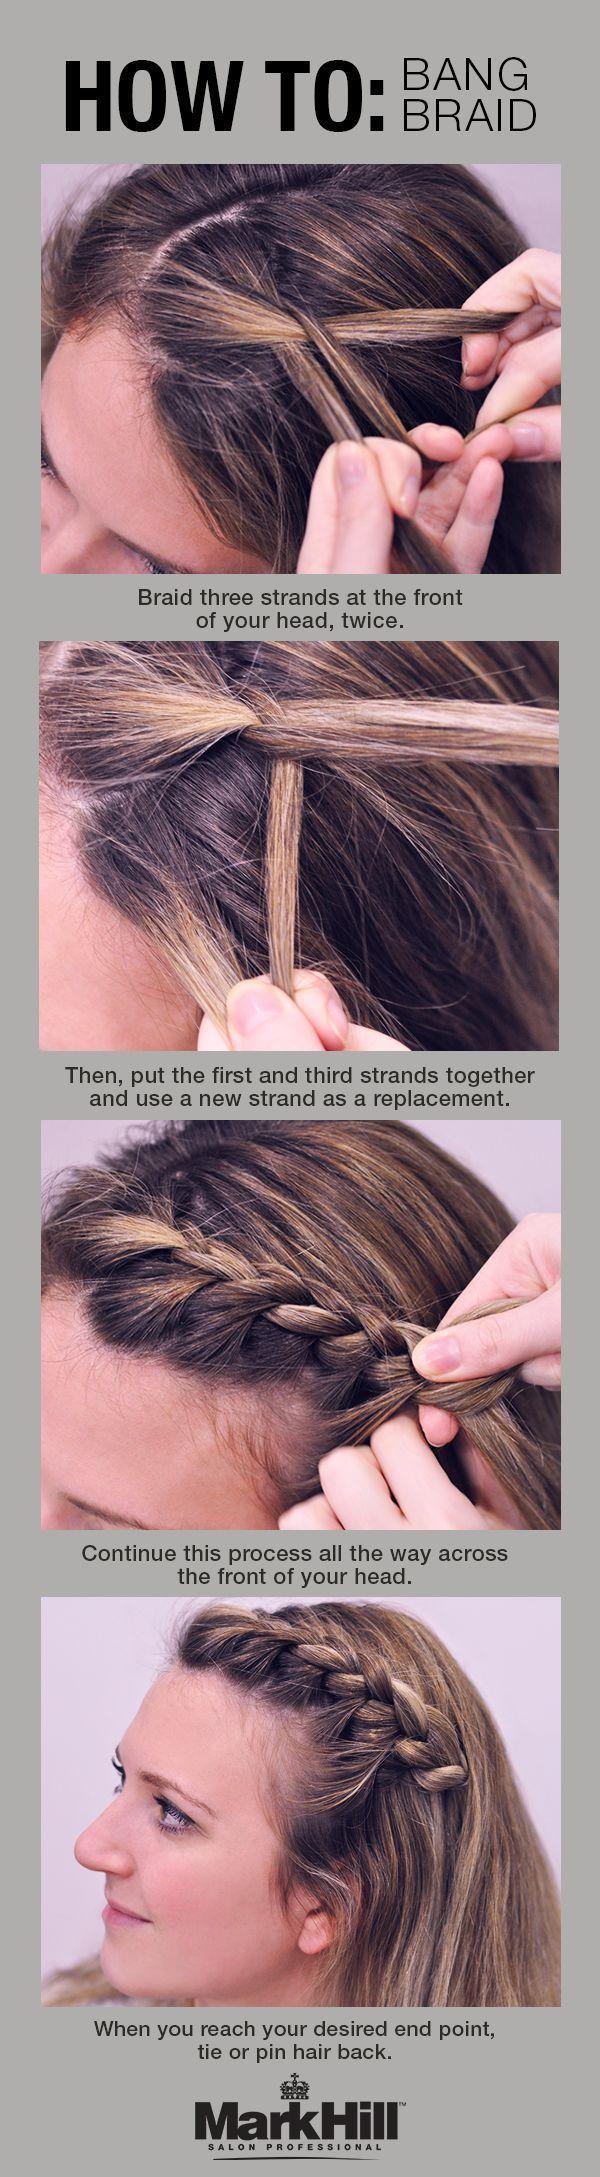 ingenious hair hacks for the gym hair style bang braids and bangs